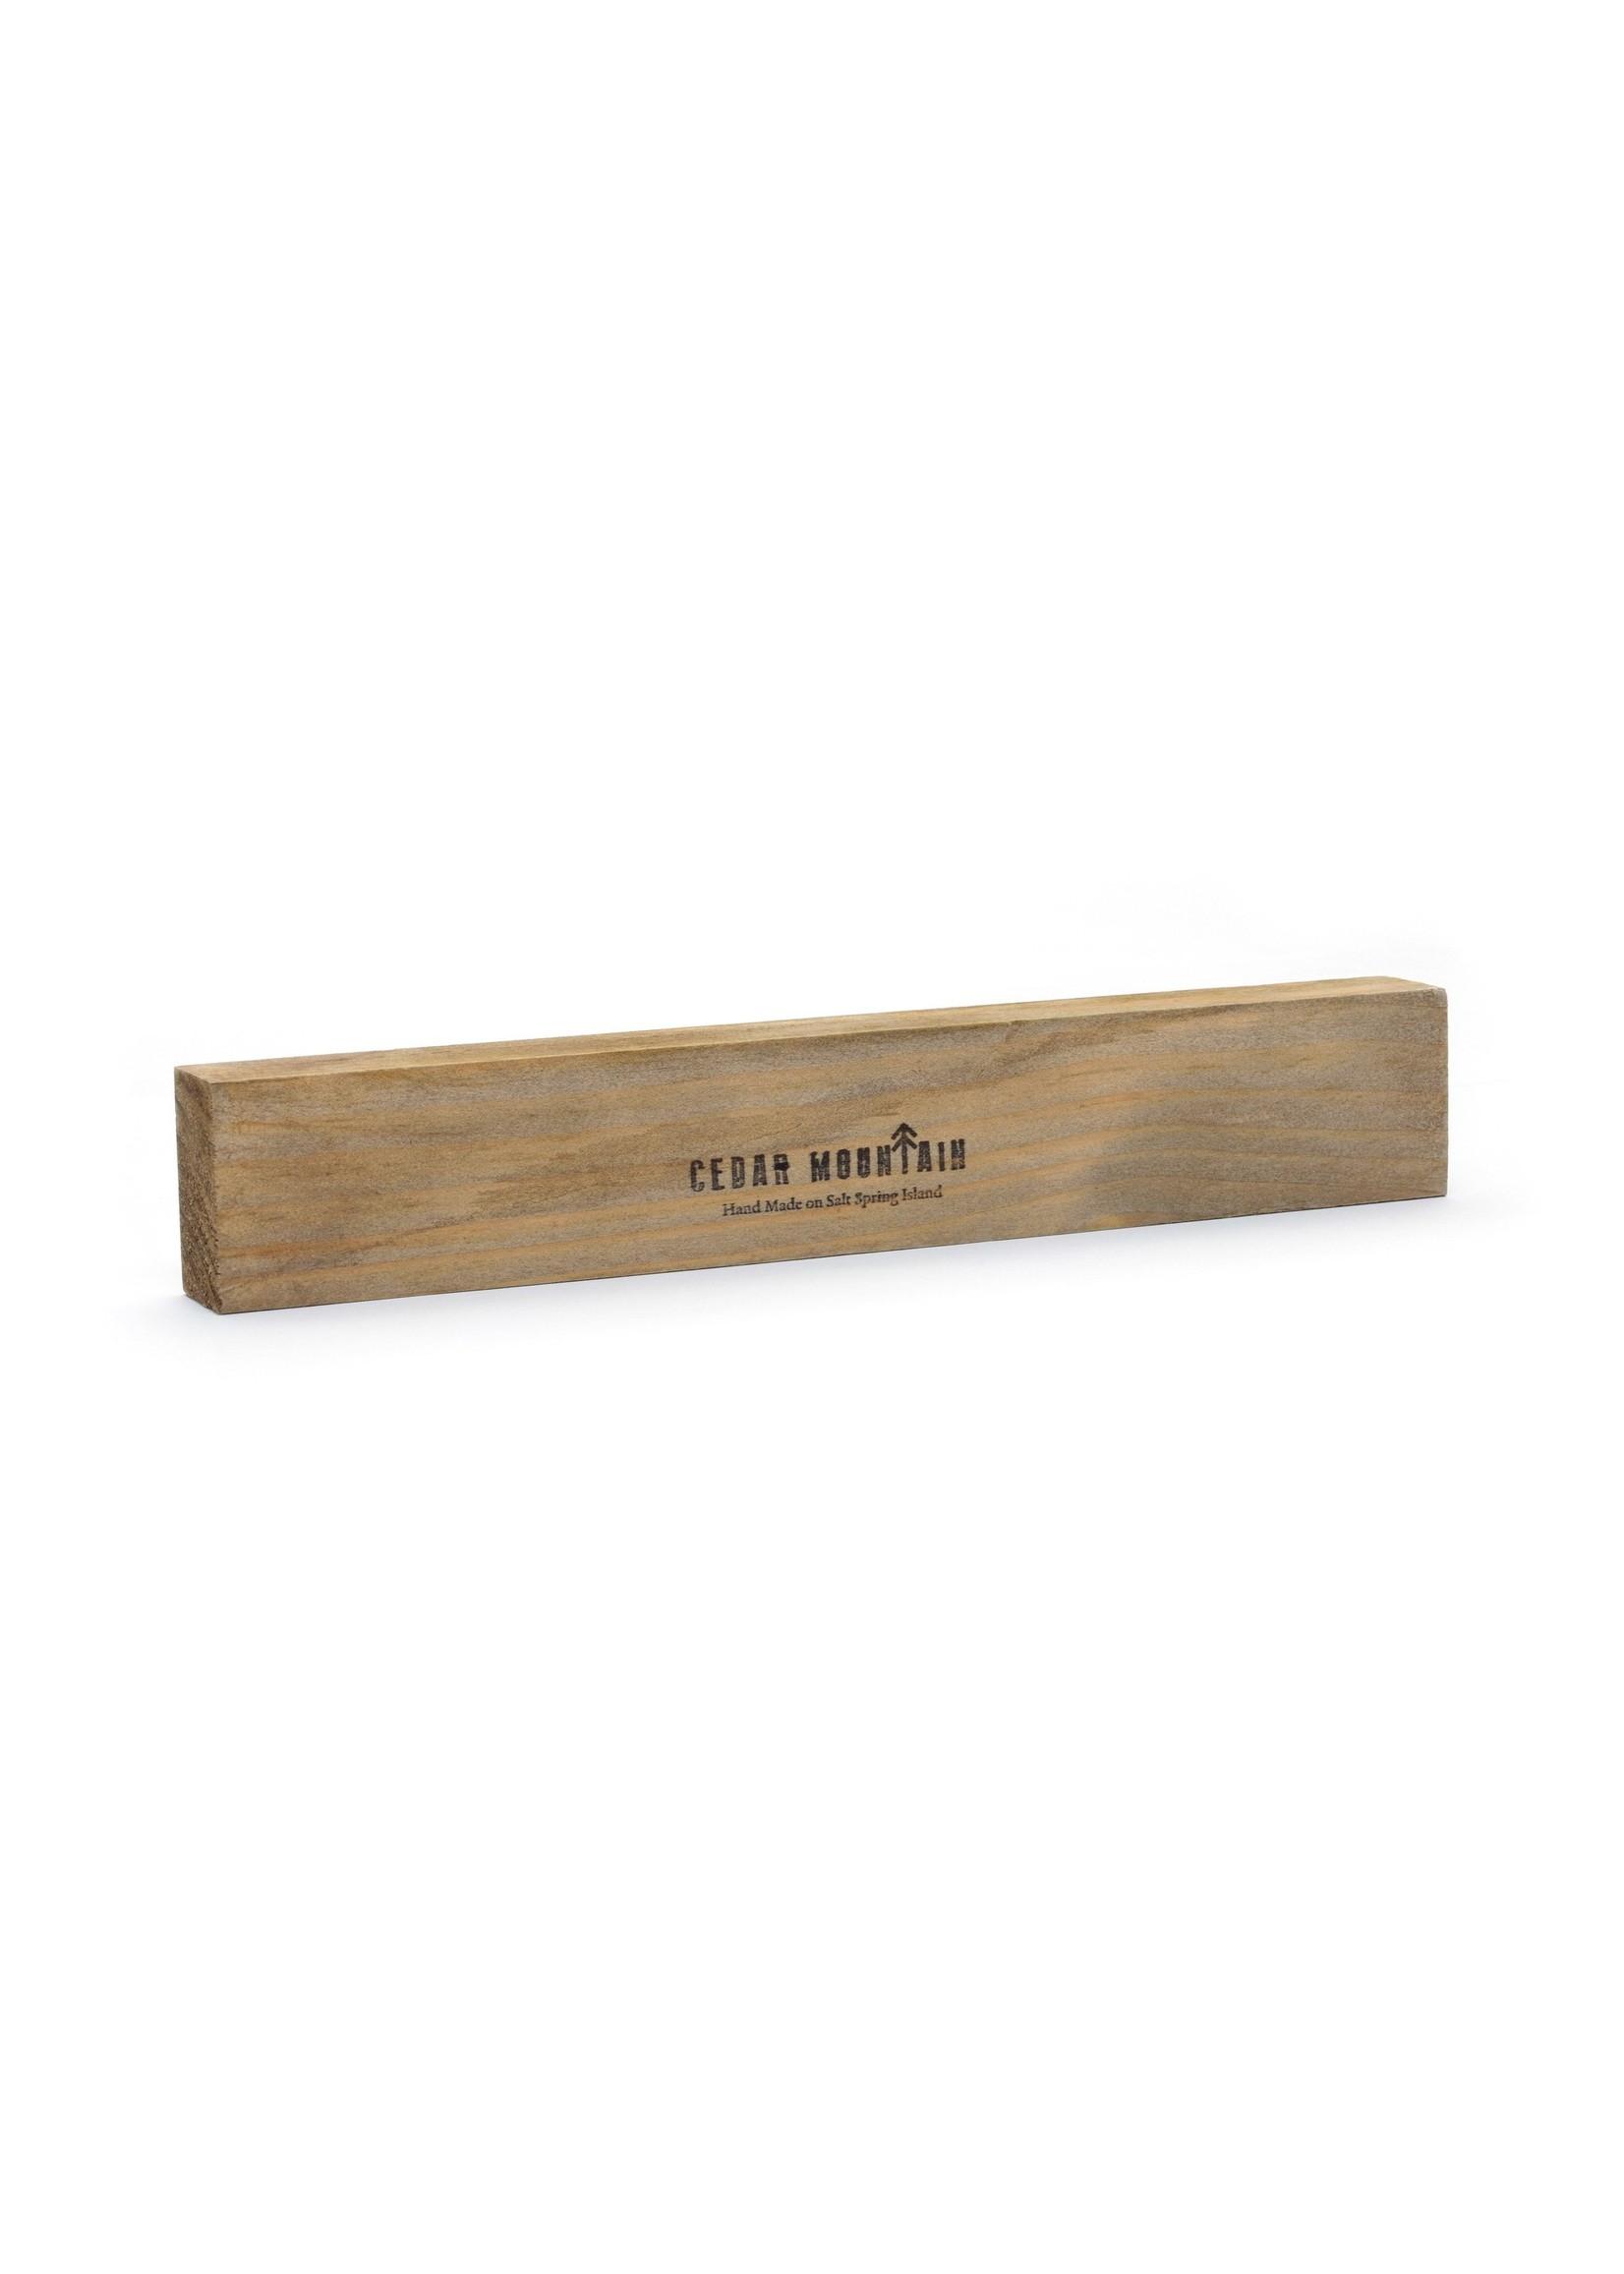 Cedar Mountain Studios Stay Strong Timber Bit